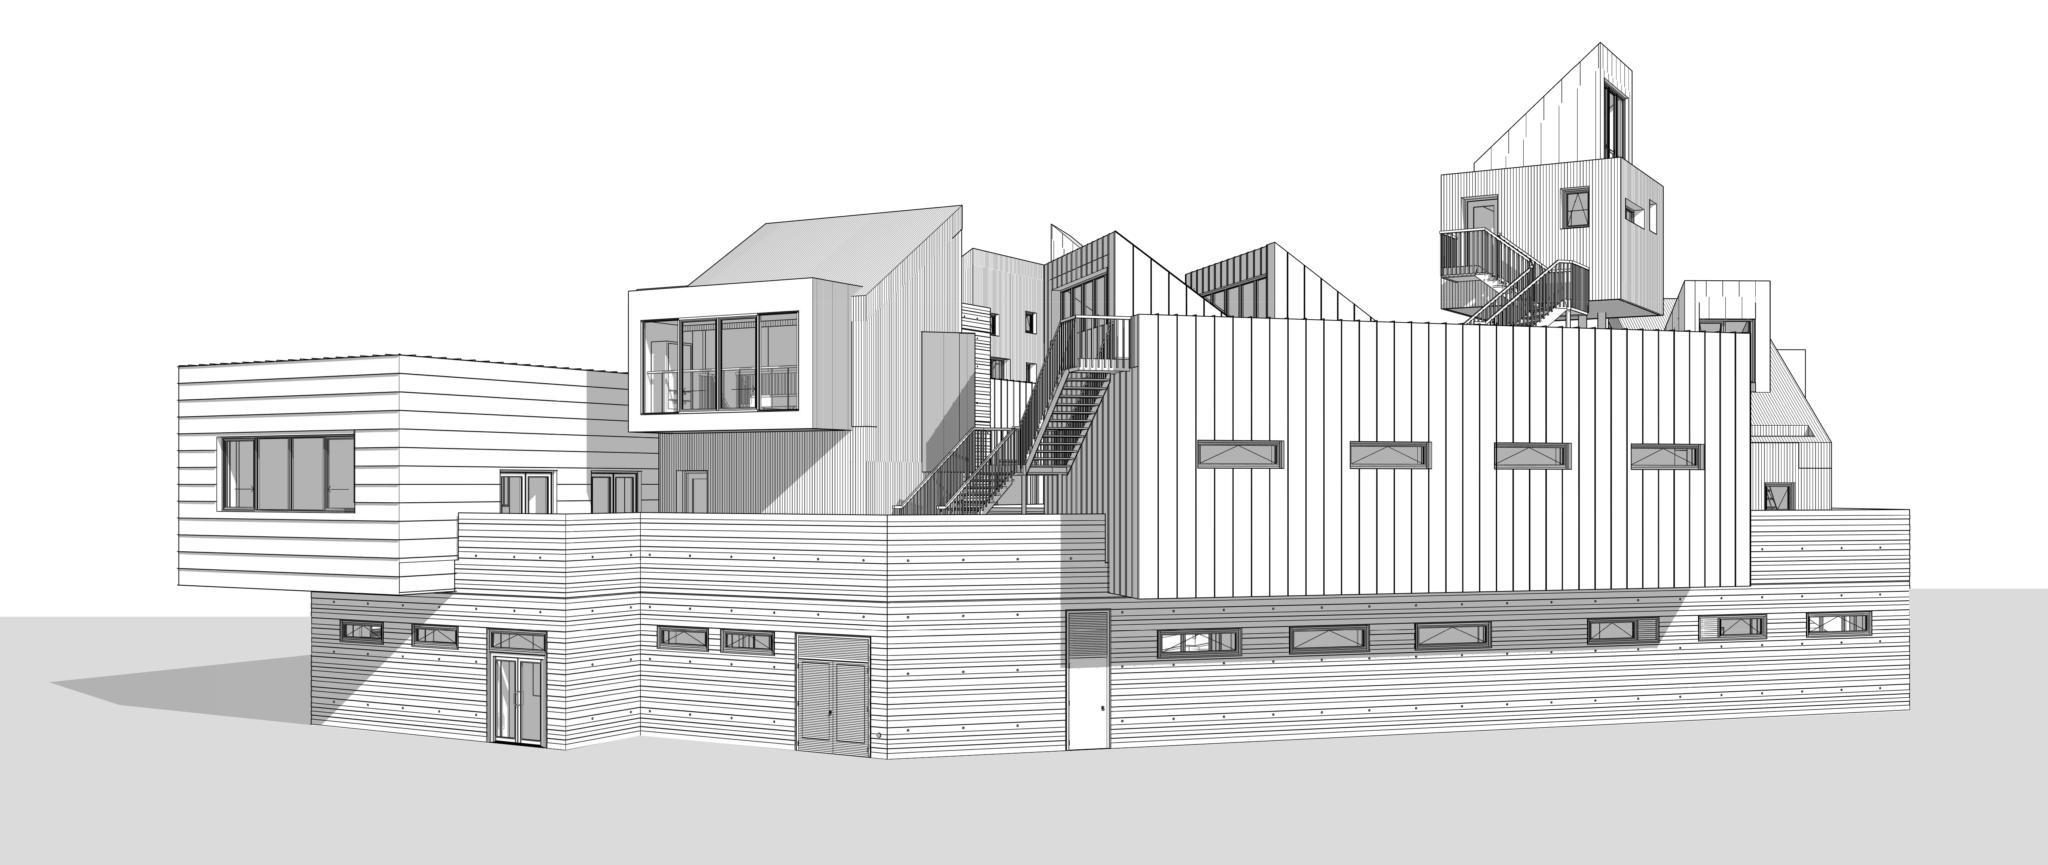 East Quay Cultural and Enterprise Development, Watchet